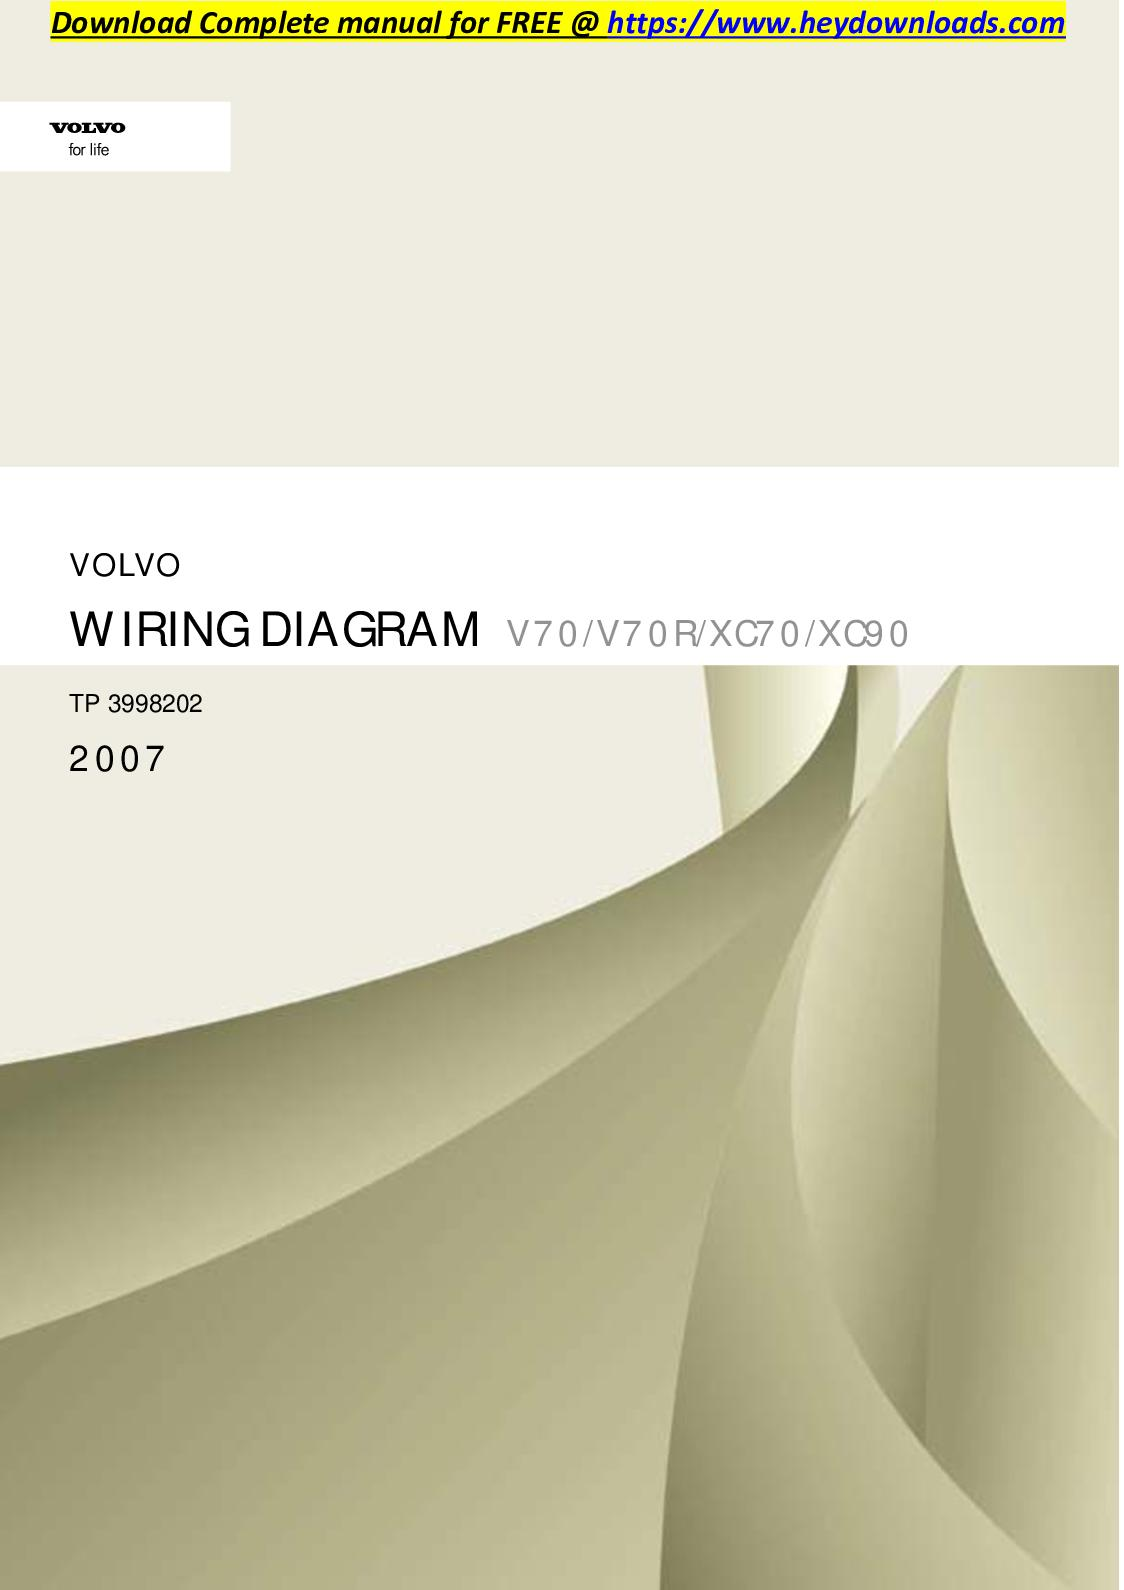 calam�o volvo xc70 2007 v70 v70r xc70 xc90 wiring diagram Volvo S80 T6 Engine Diagram